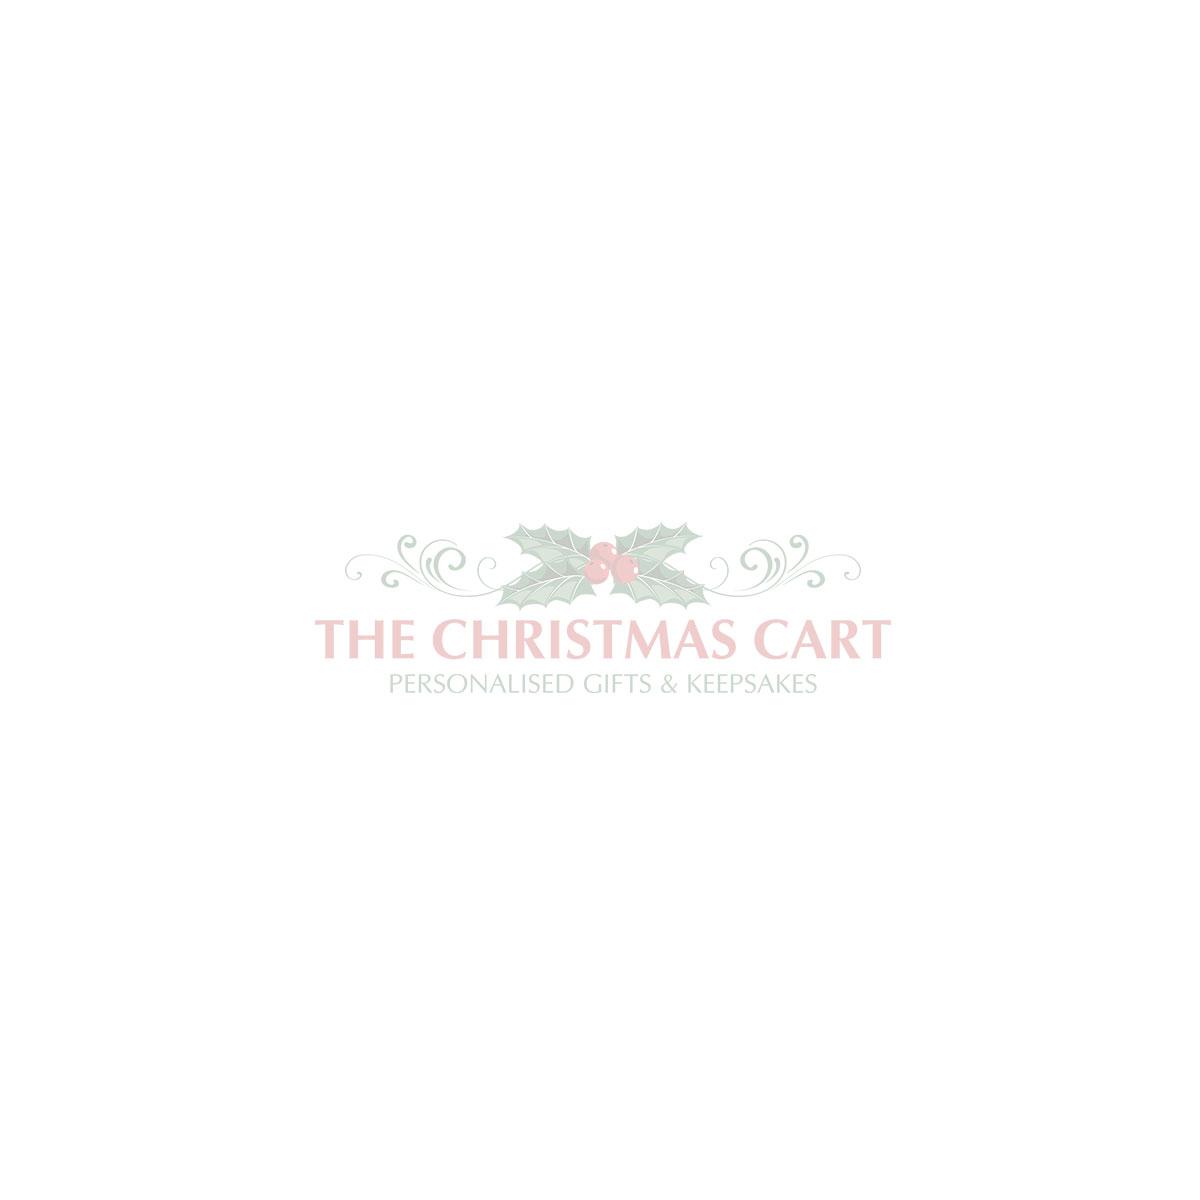 Black and White Check Leaf Spray with Fur Trim